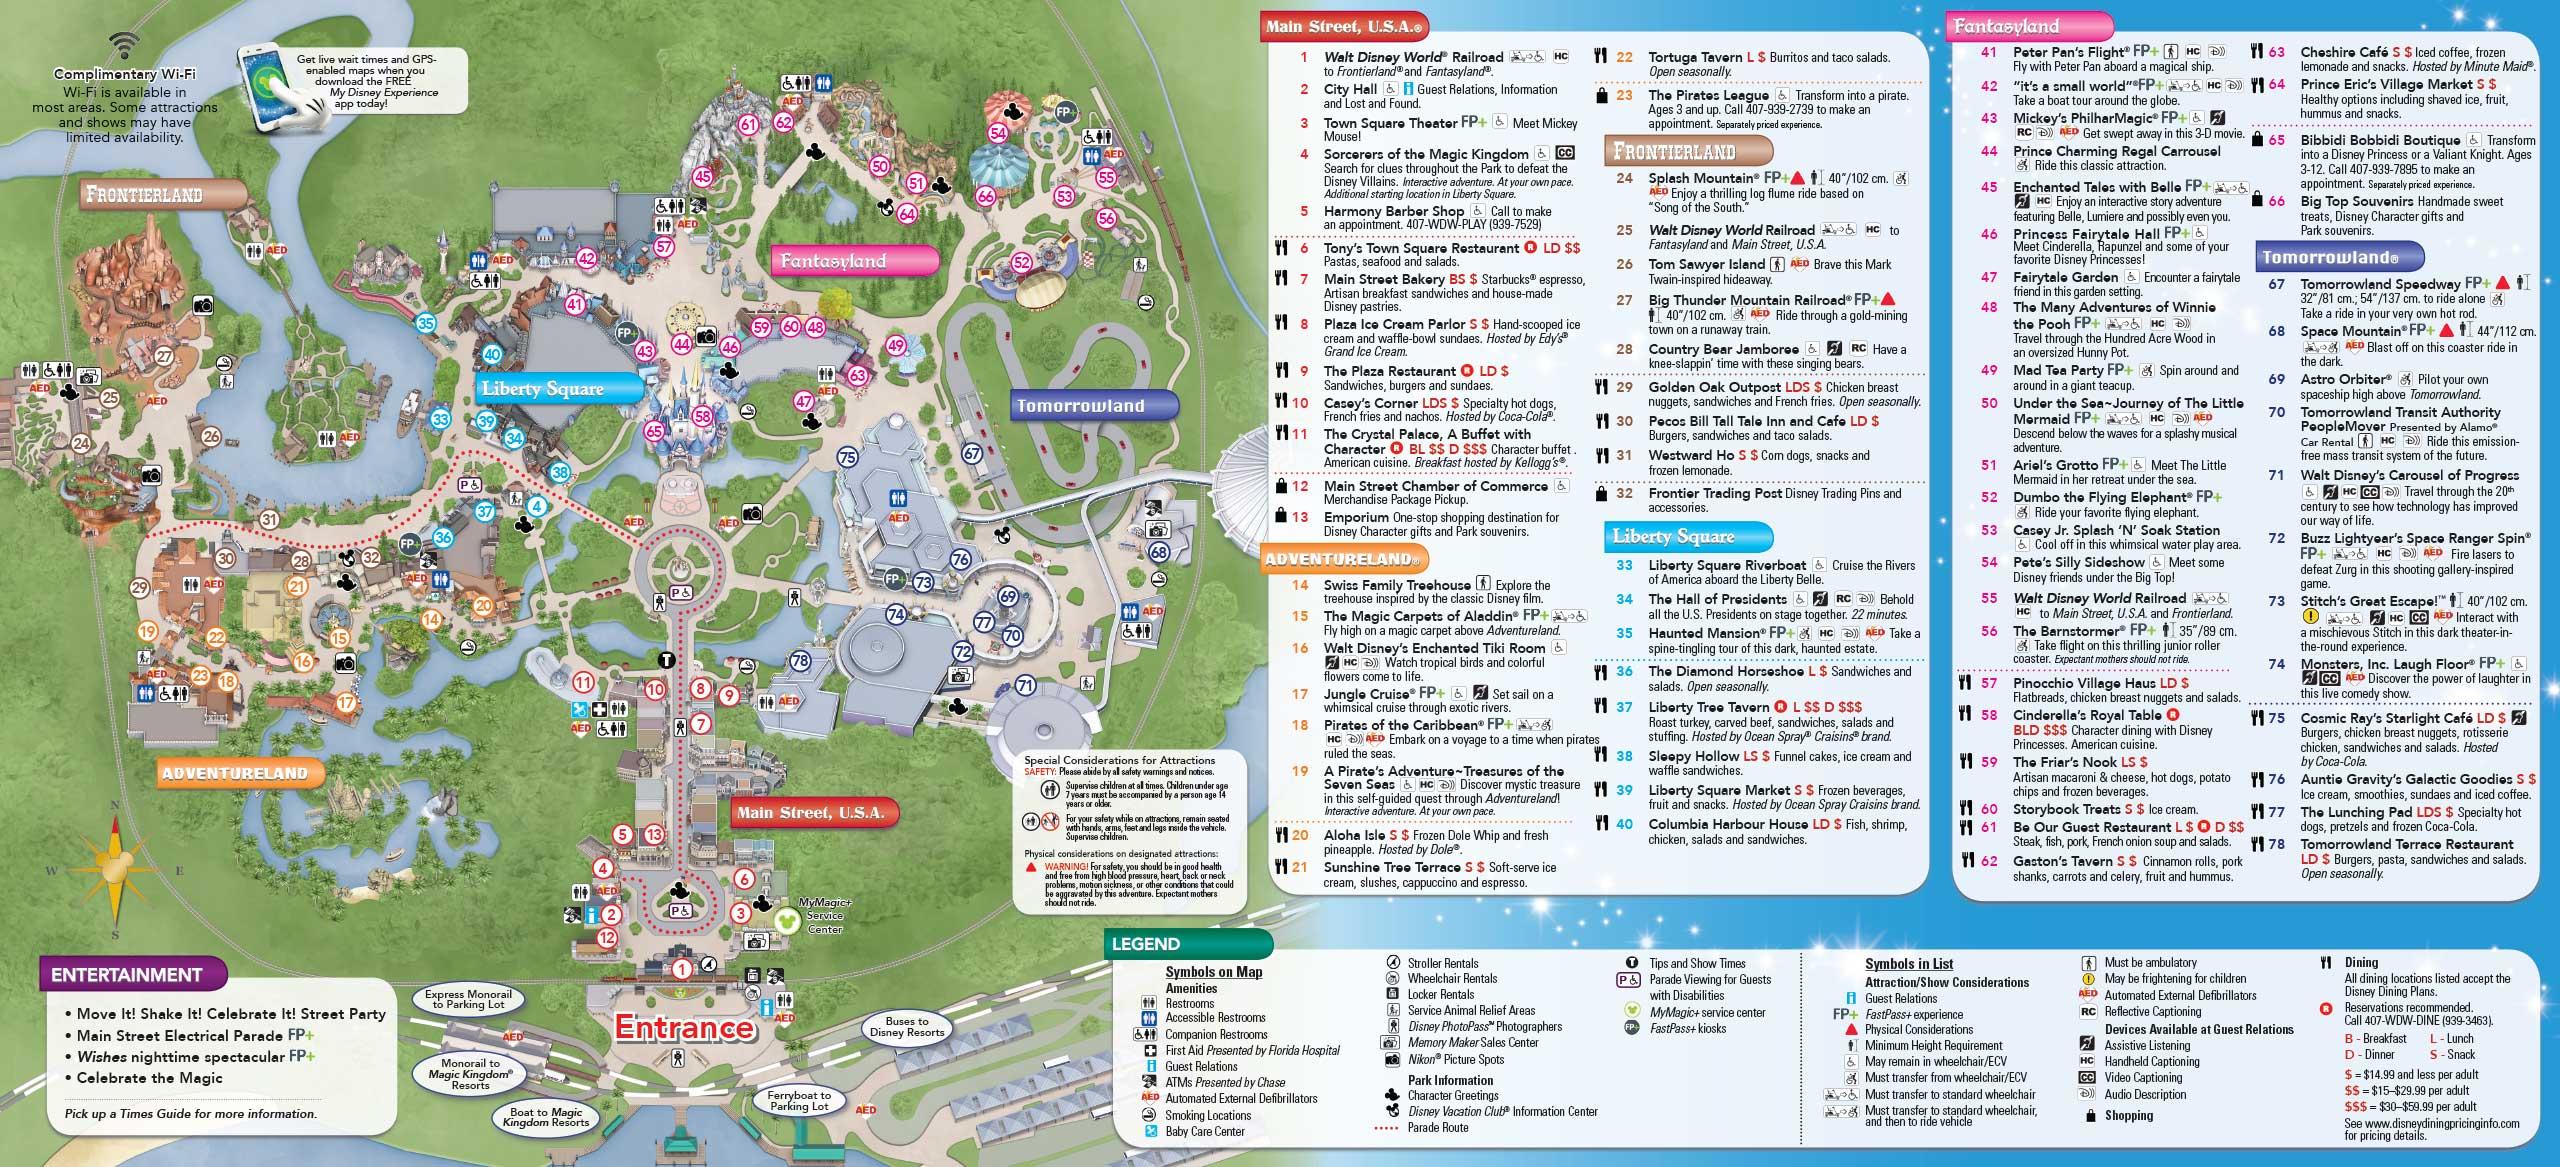 MyMagic+ and FastPass+ Magic Kingdom and Disney's Animal Kingdom guide maps